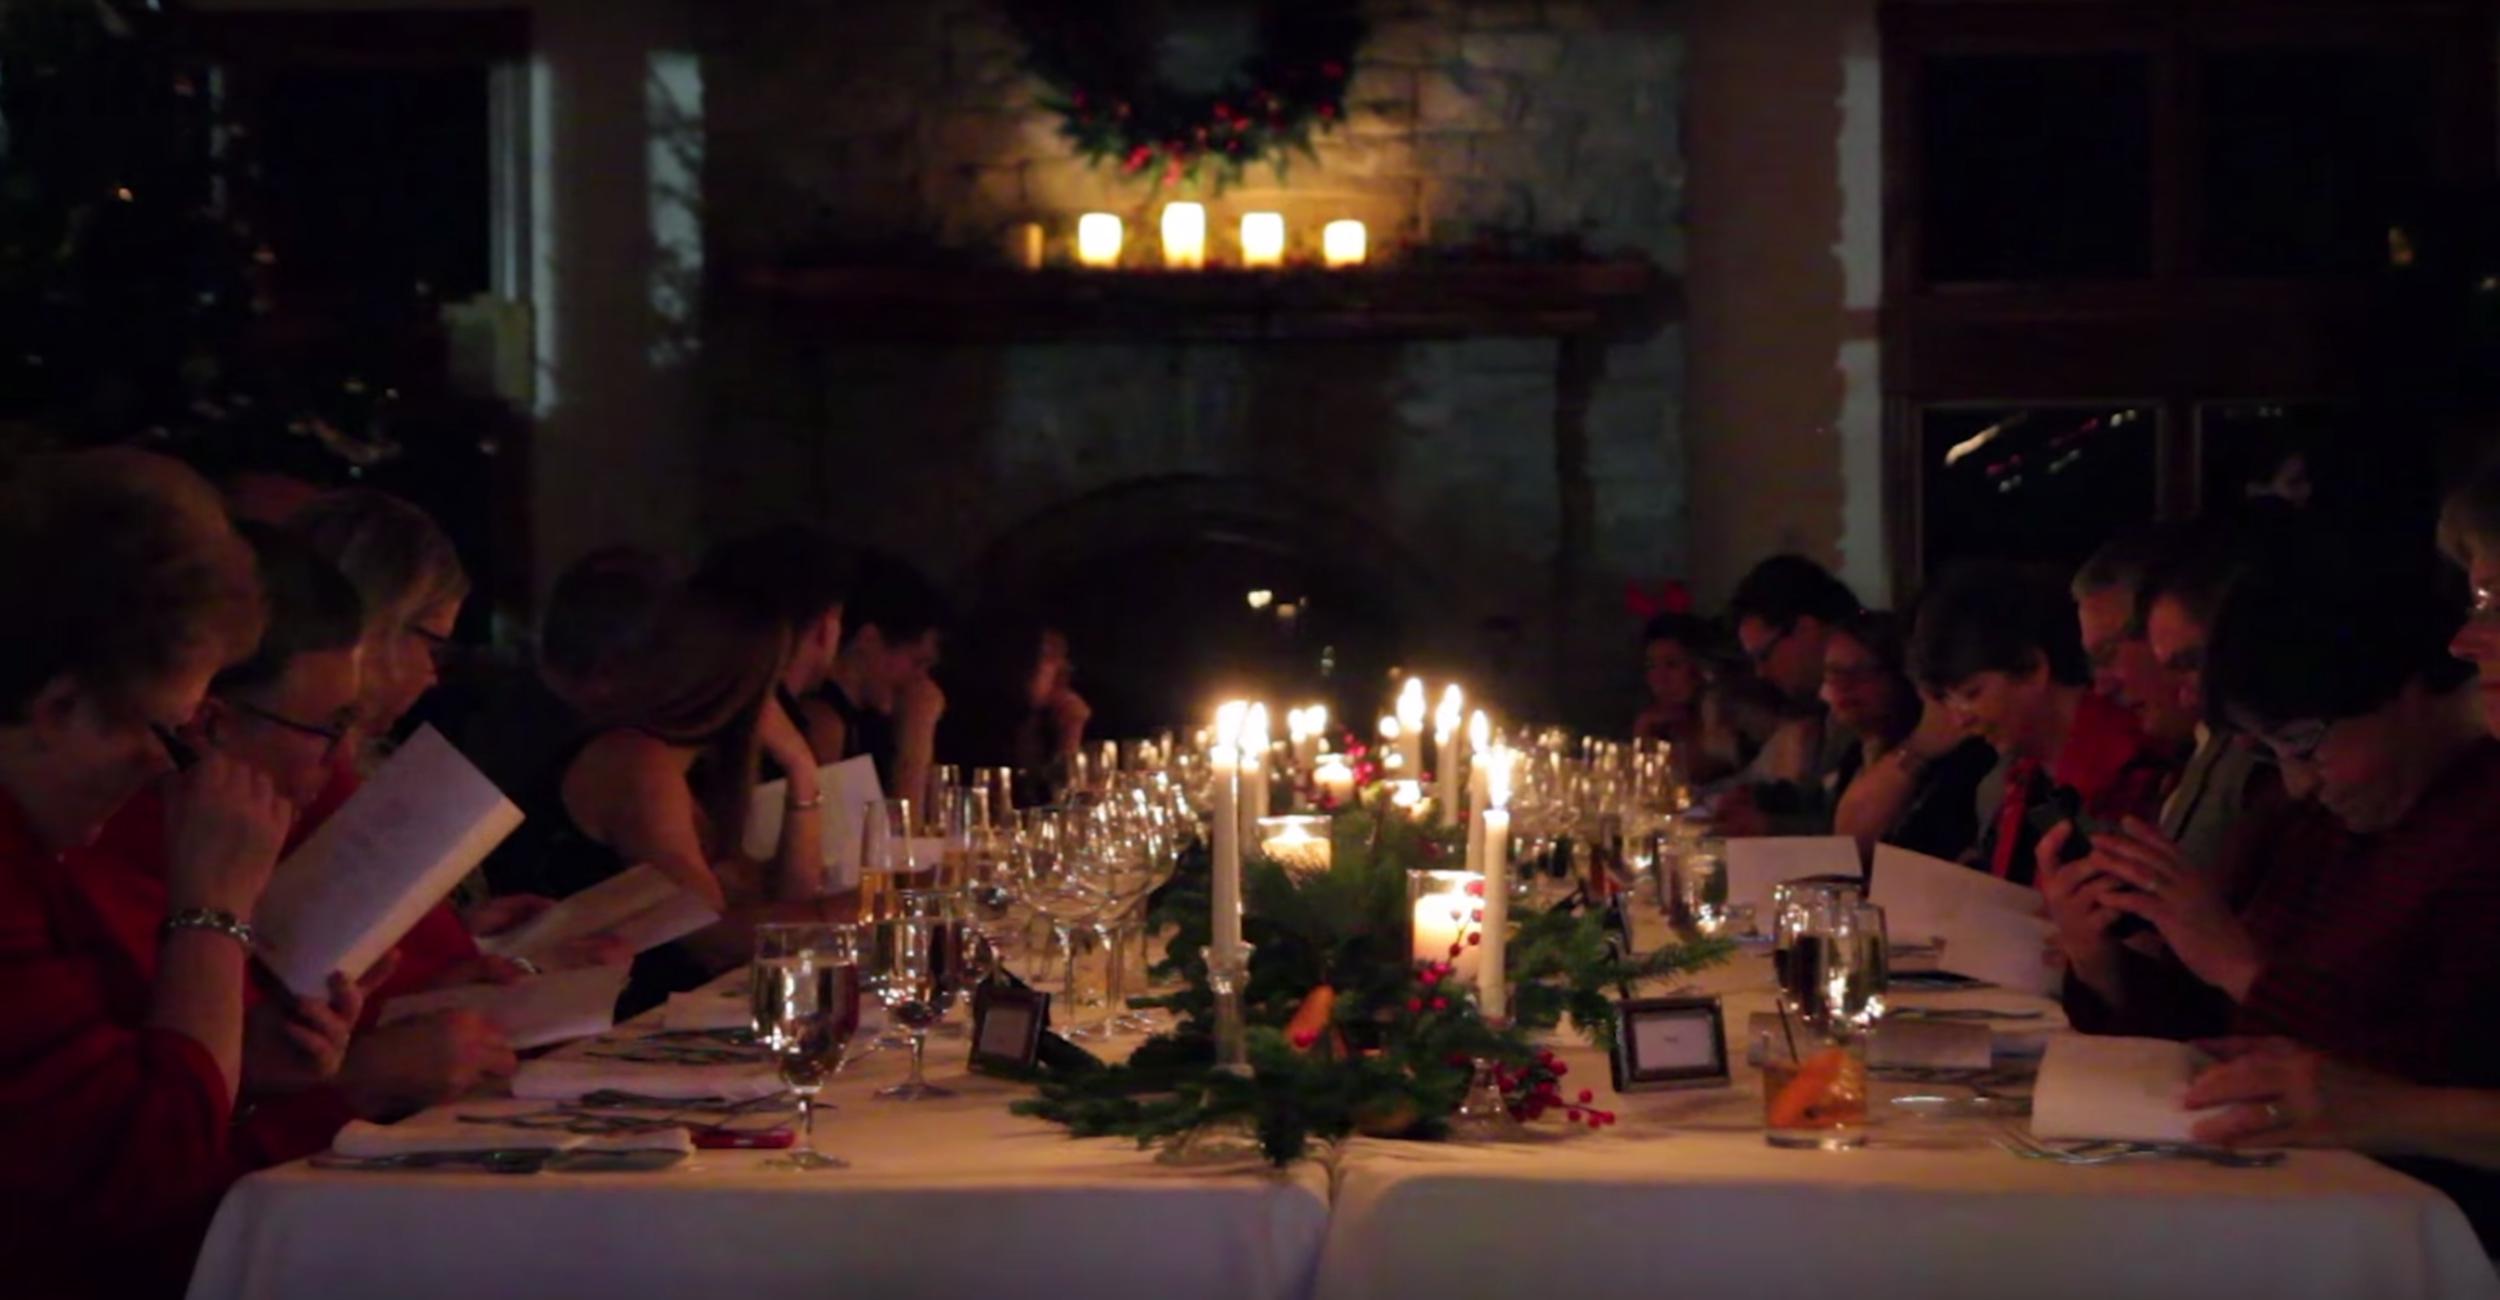 http://www.culinaryvegetableinstitute.com/